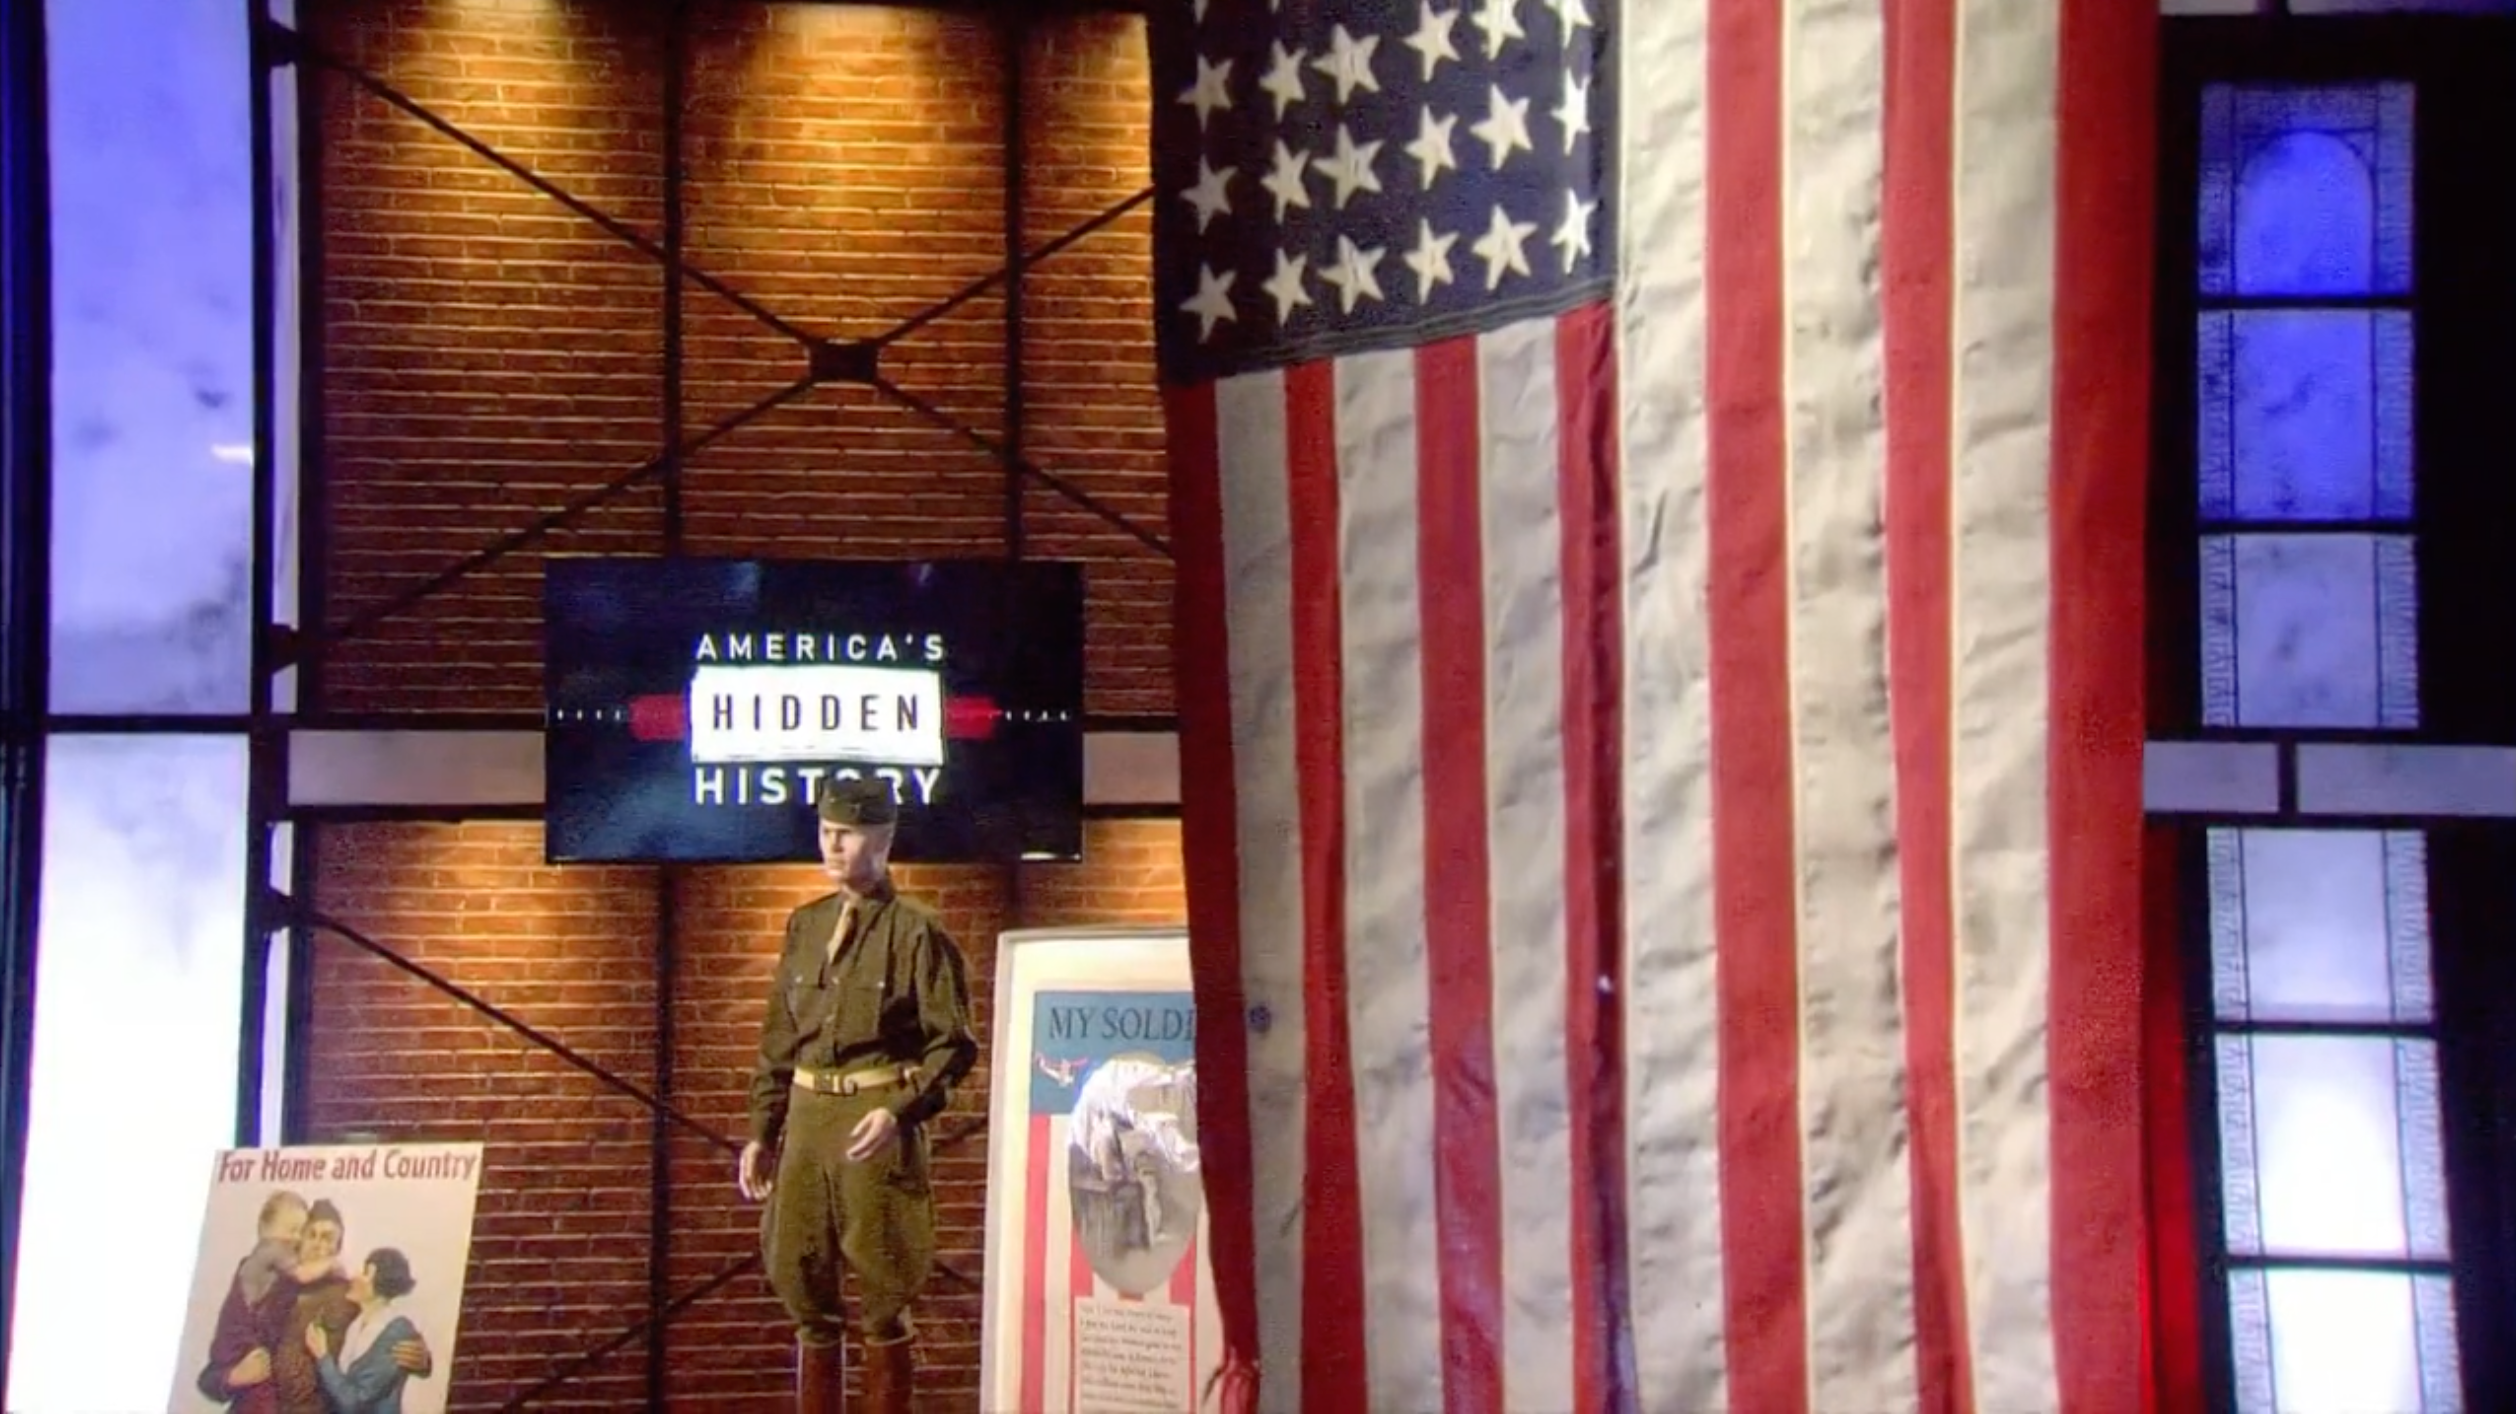 America's Hidden History | Memorial Day